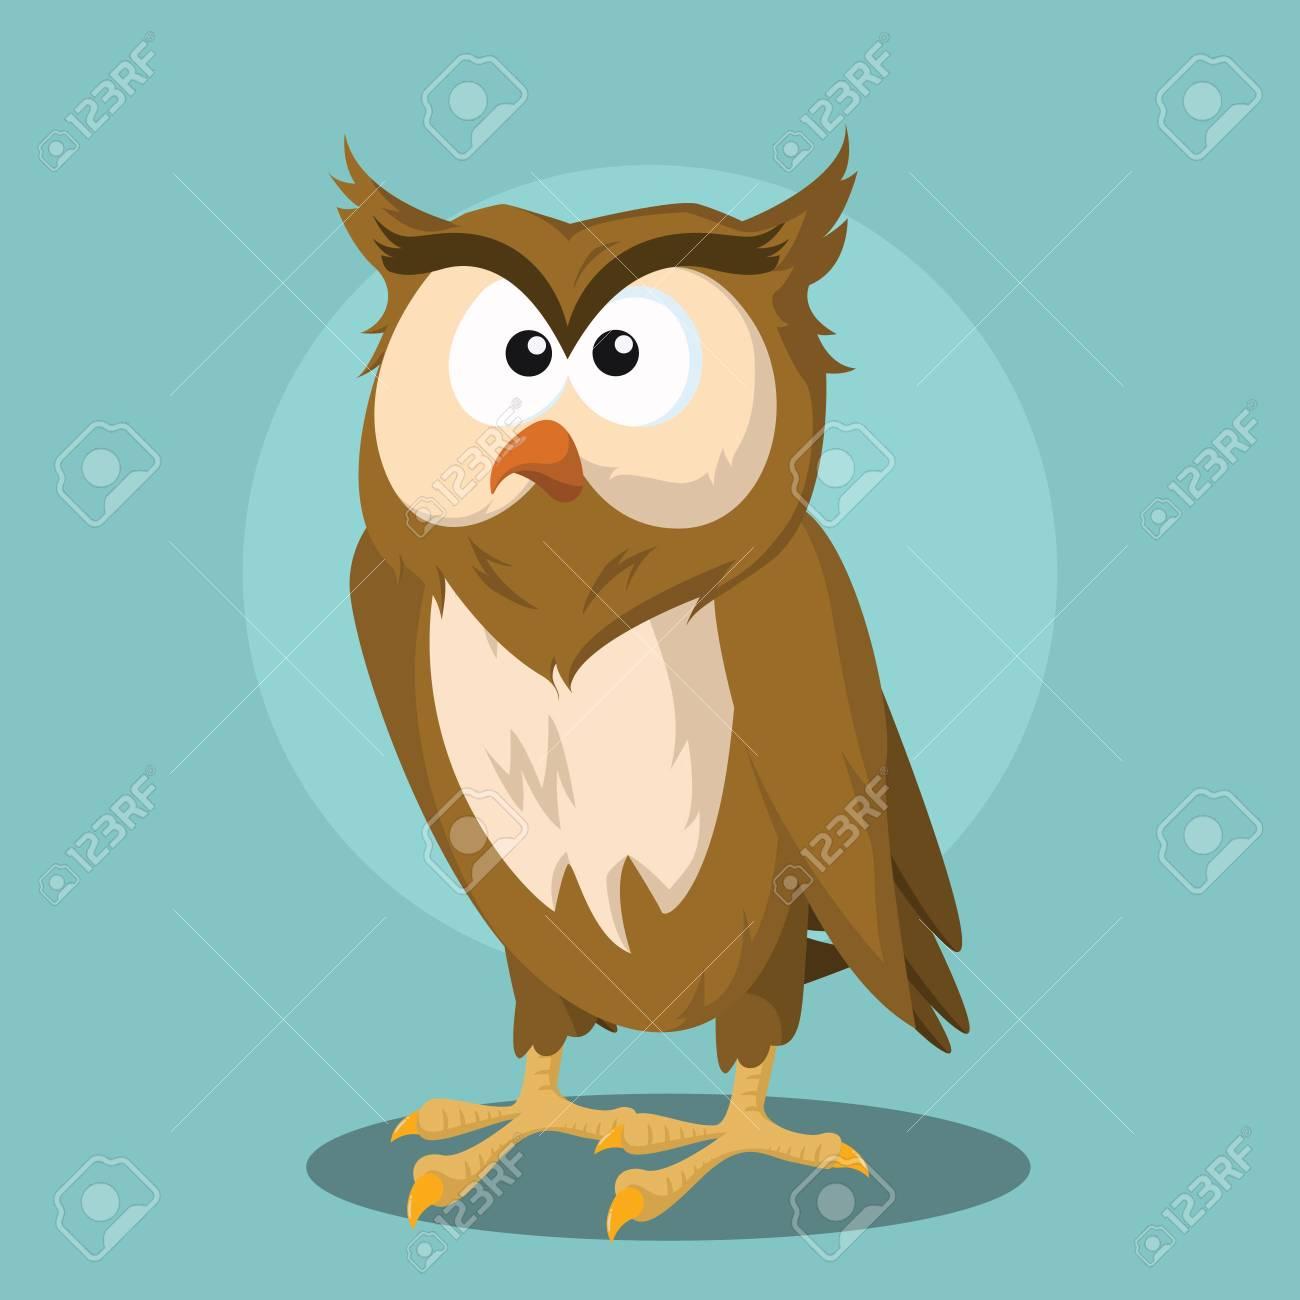 owl vector illustration design - 64666875